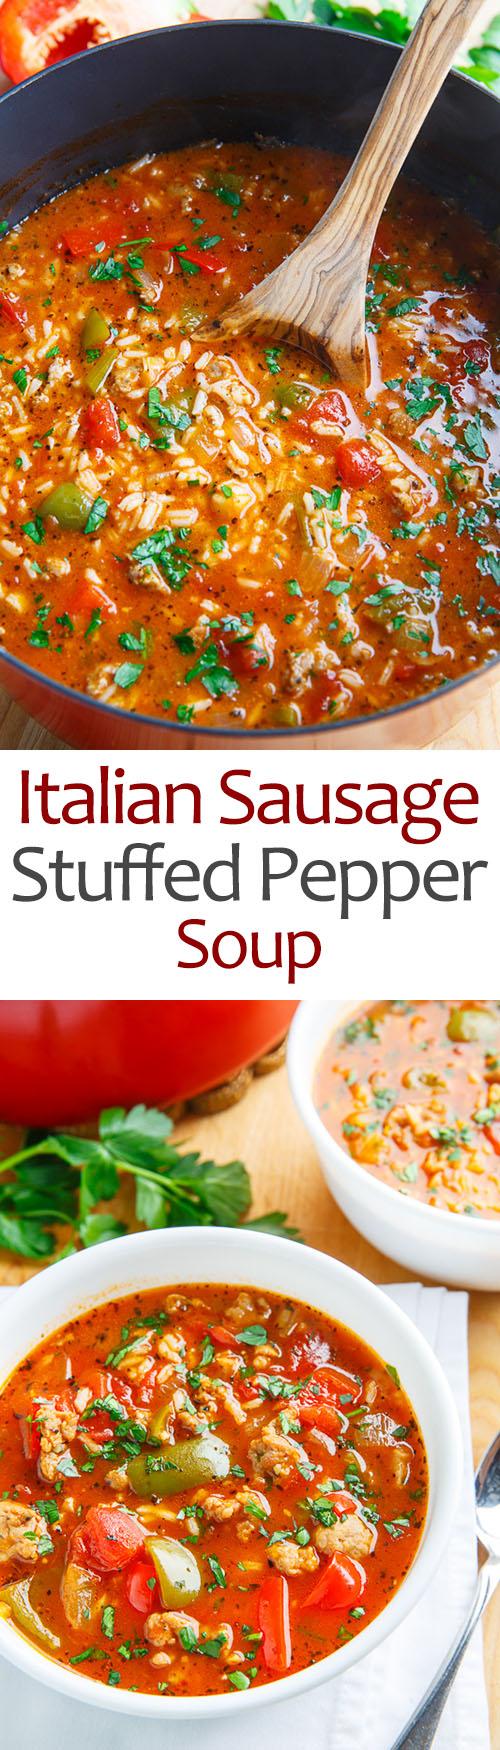 Italian Sausage Stuffed Pepper Soup